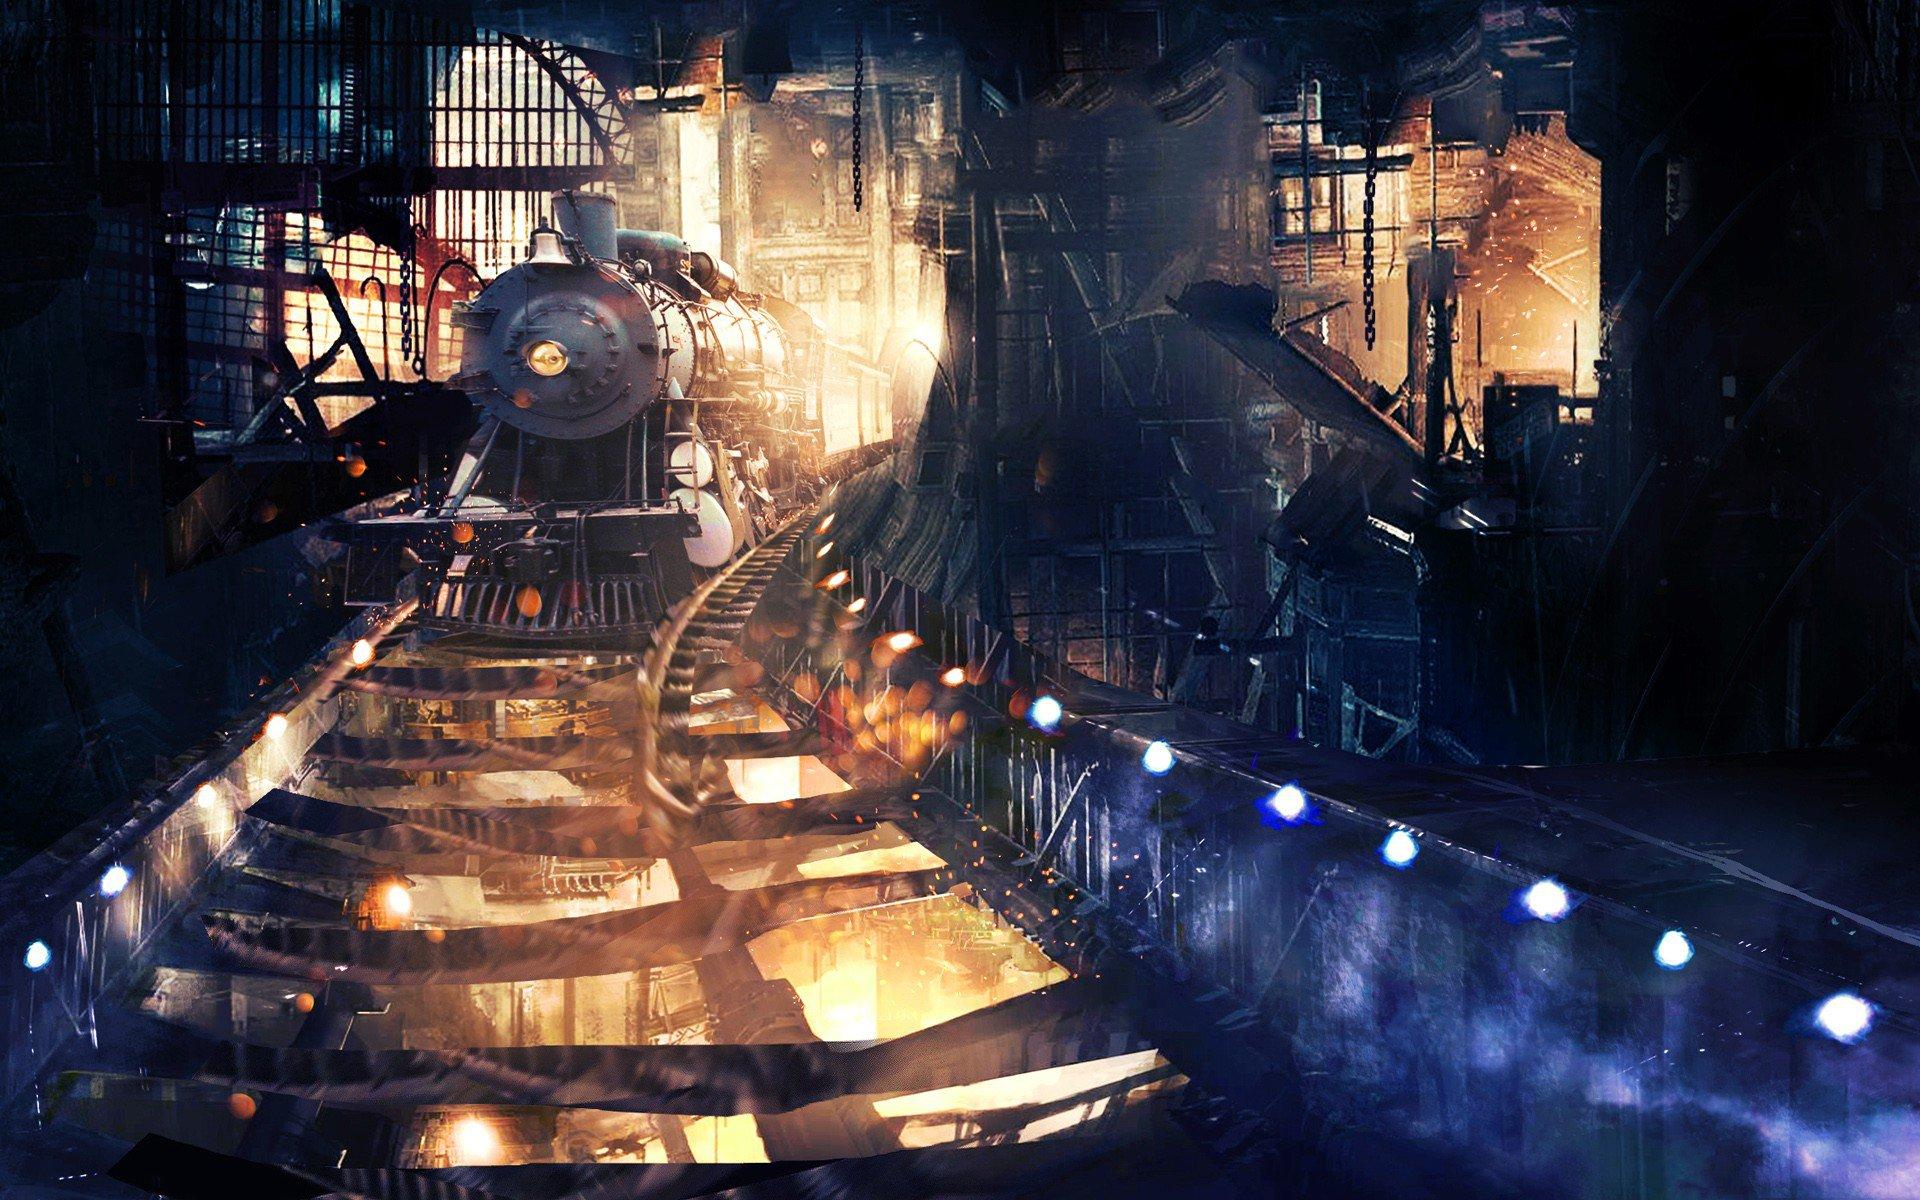 Train Travel Fantasy 4k Hd Desktop Wallpaper For Wide: Tunnel Train Art, HD Artist, 4k Wallpapers, Images